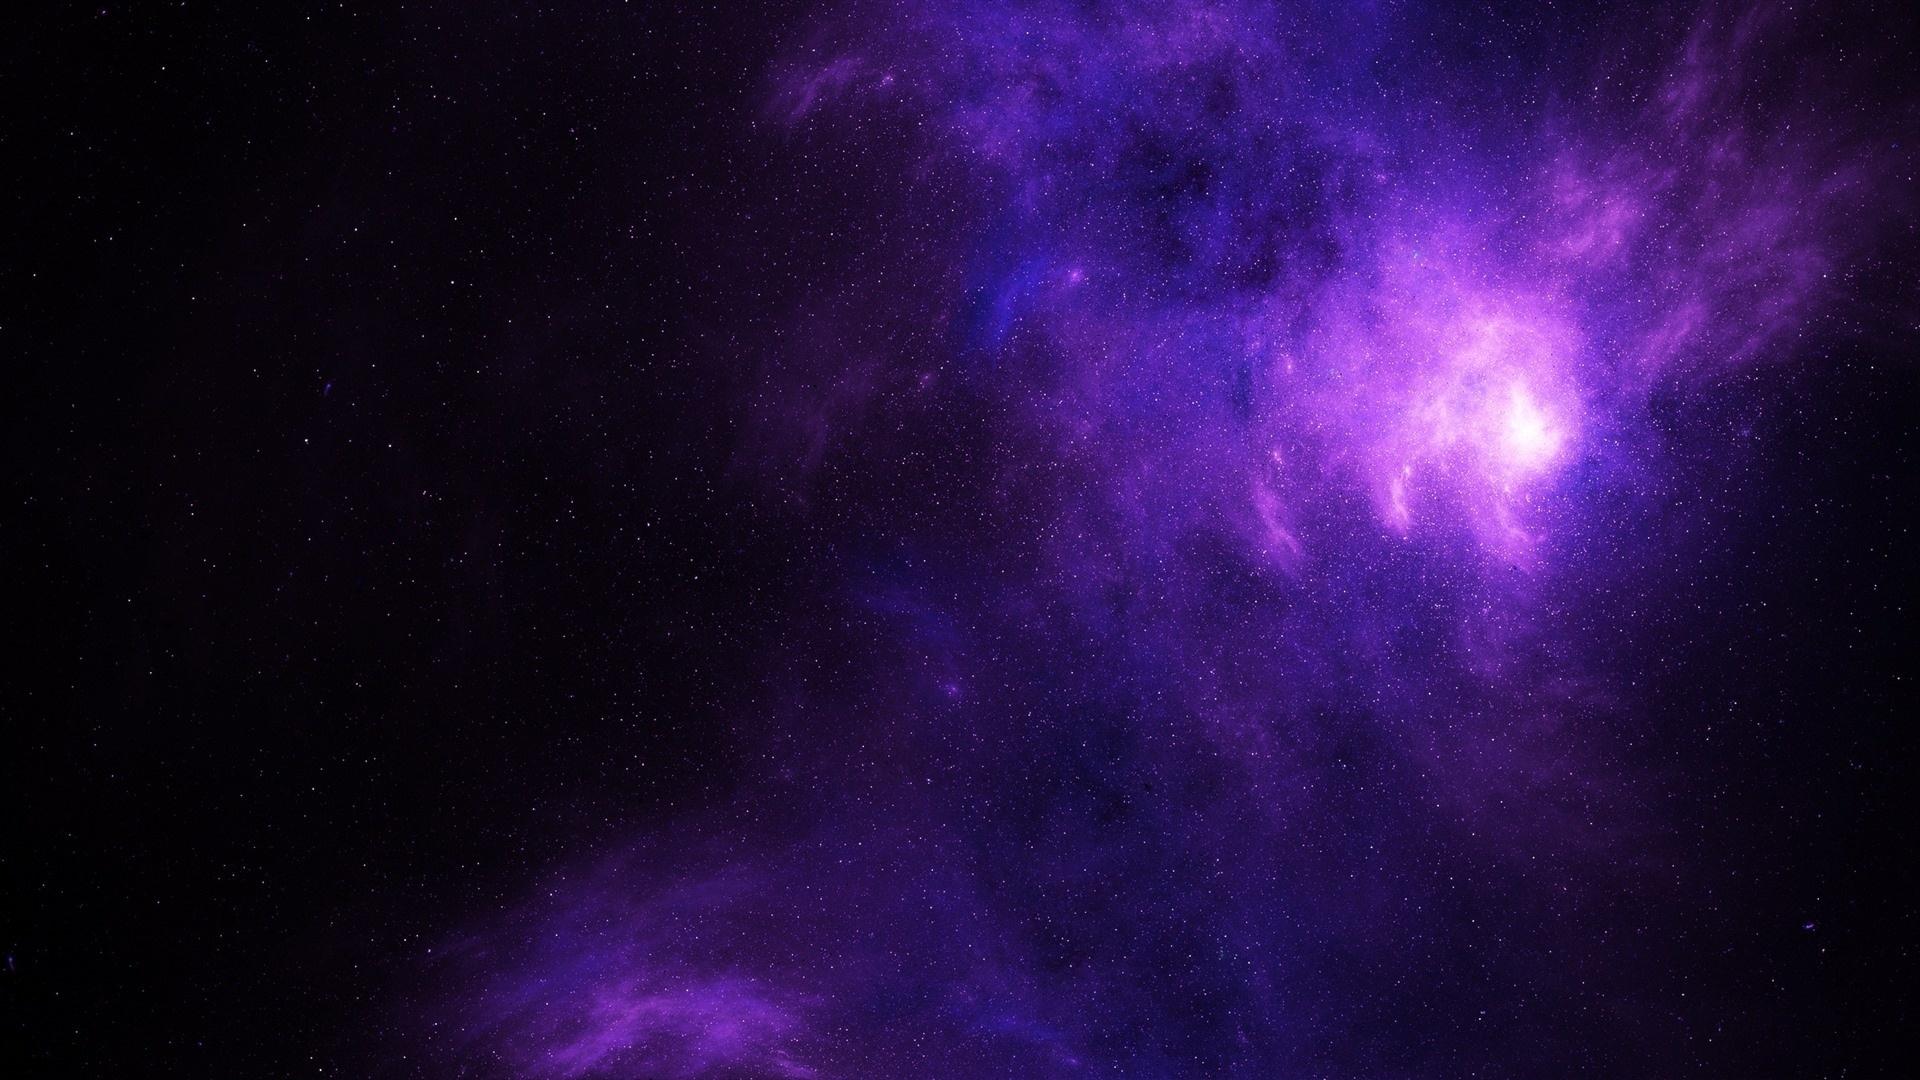 Purple Space wallpaper for desktop